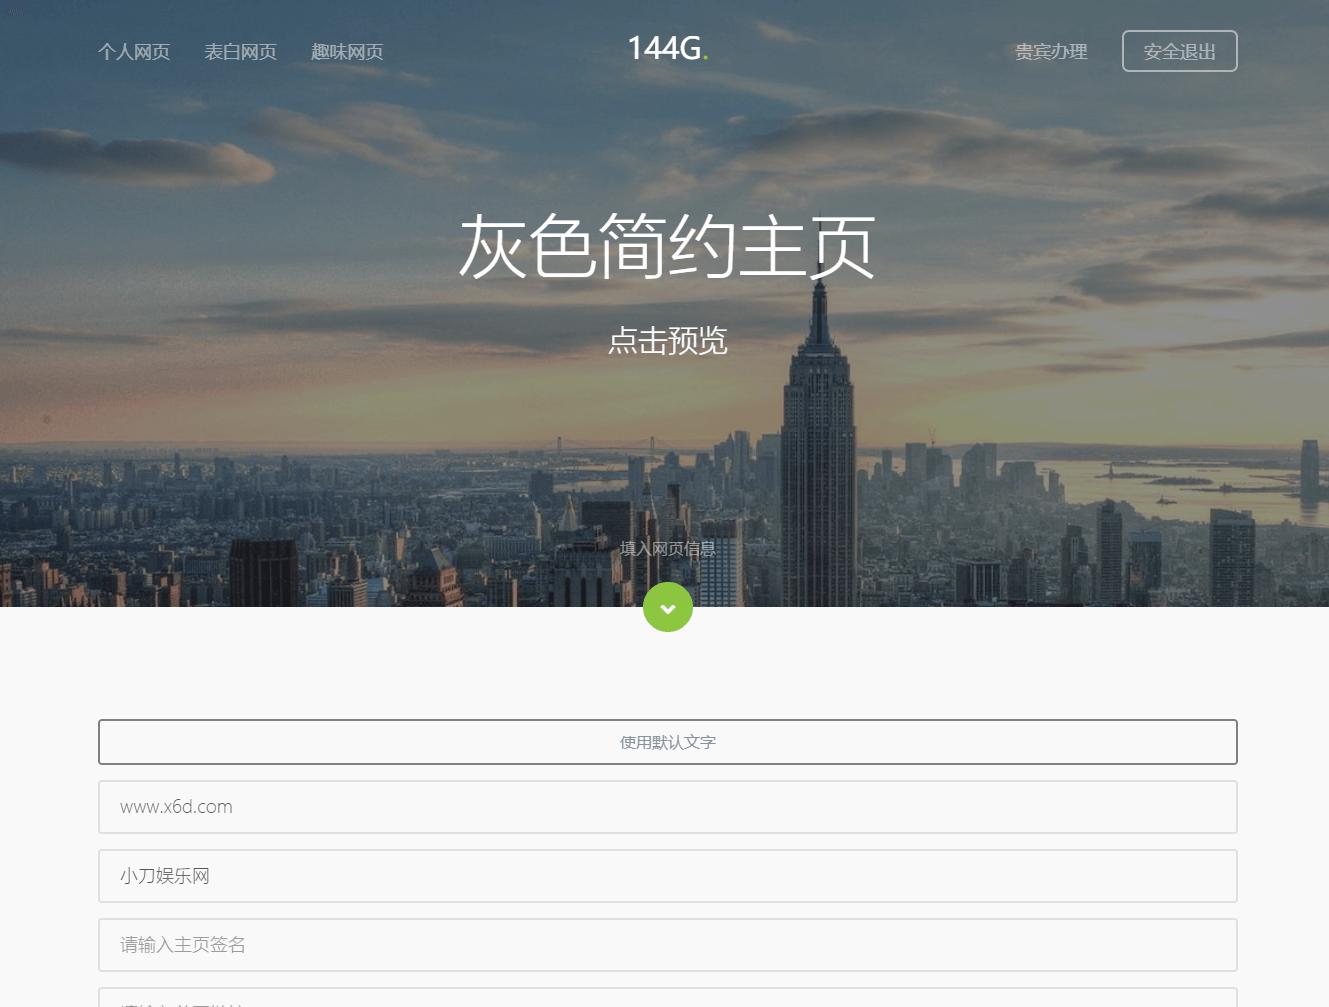 144G网页生成v1.4修复版源码-玖居暗巷